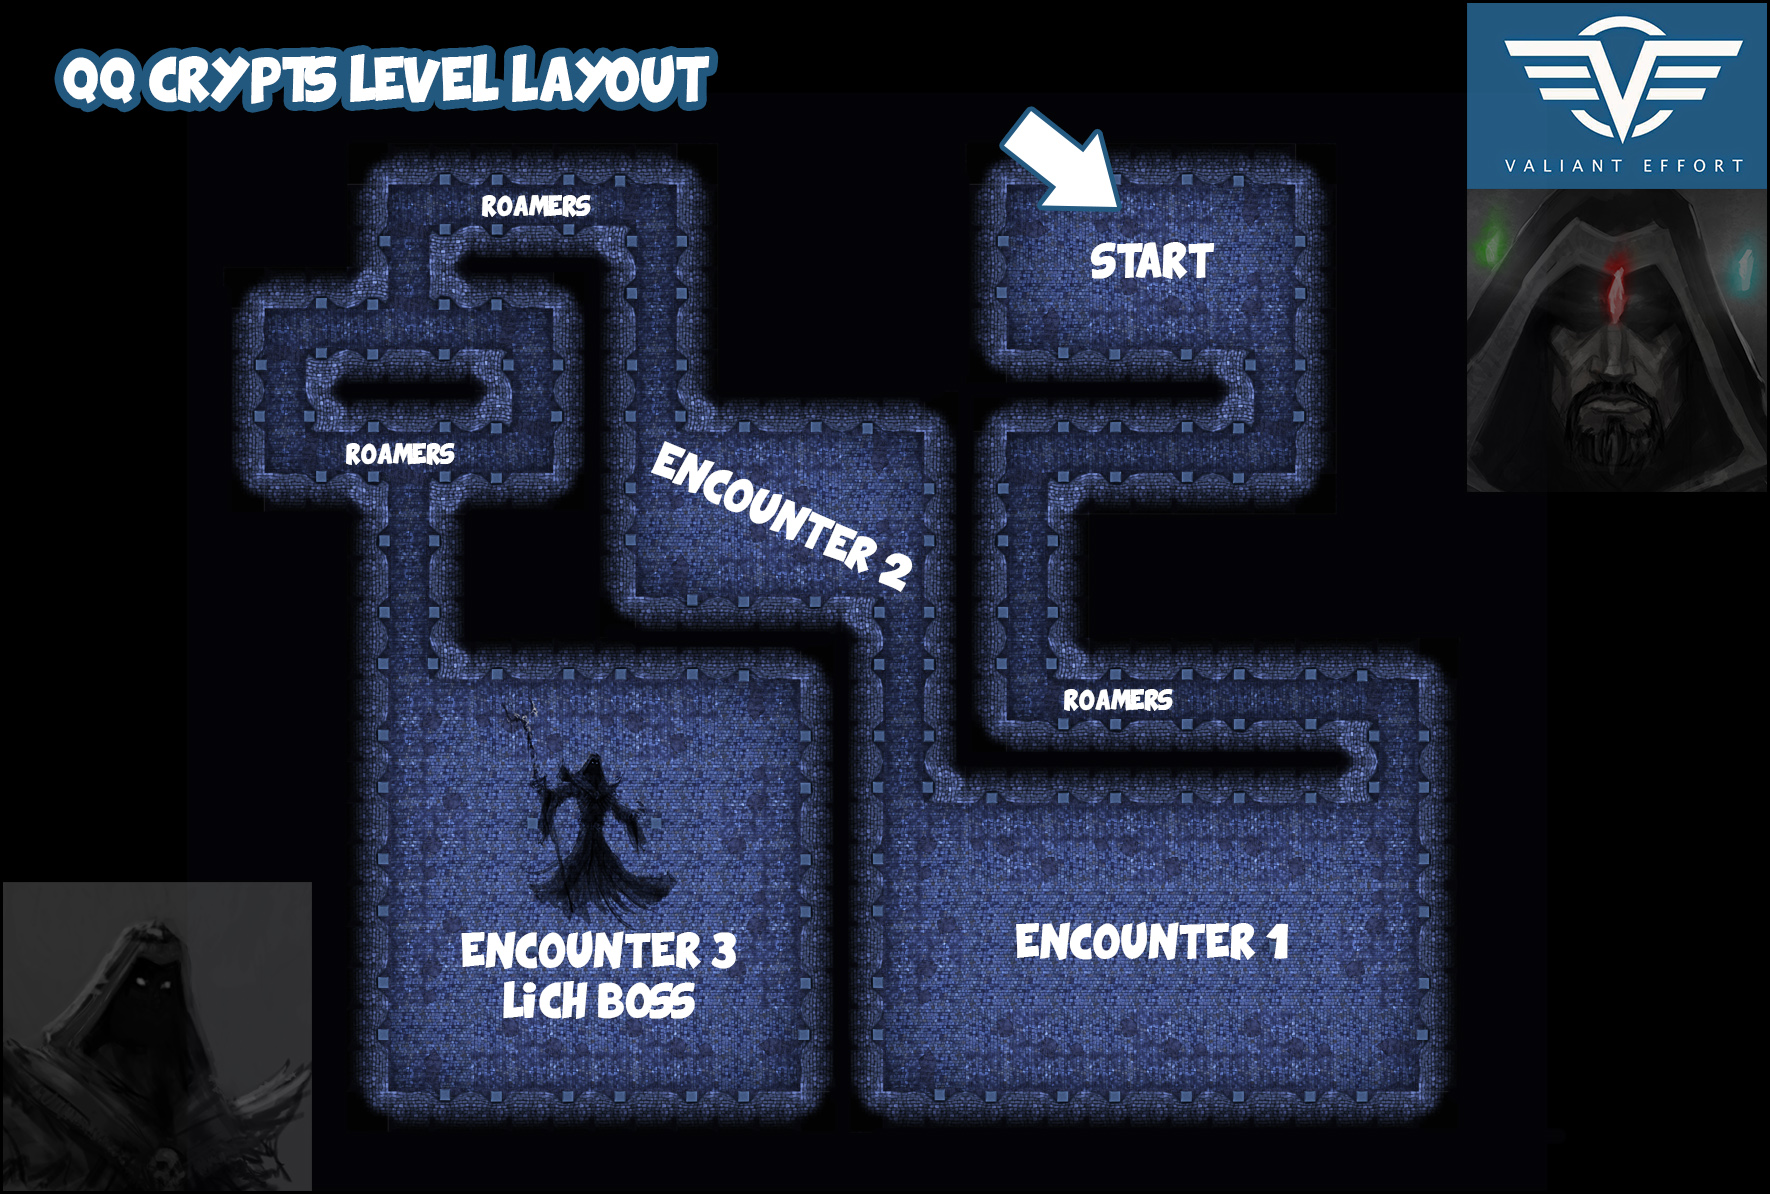 CRYPT_lvl_layout